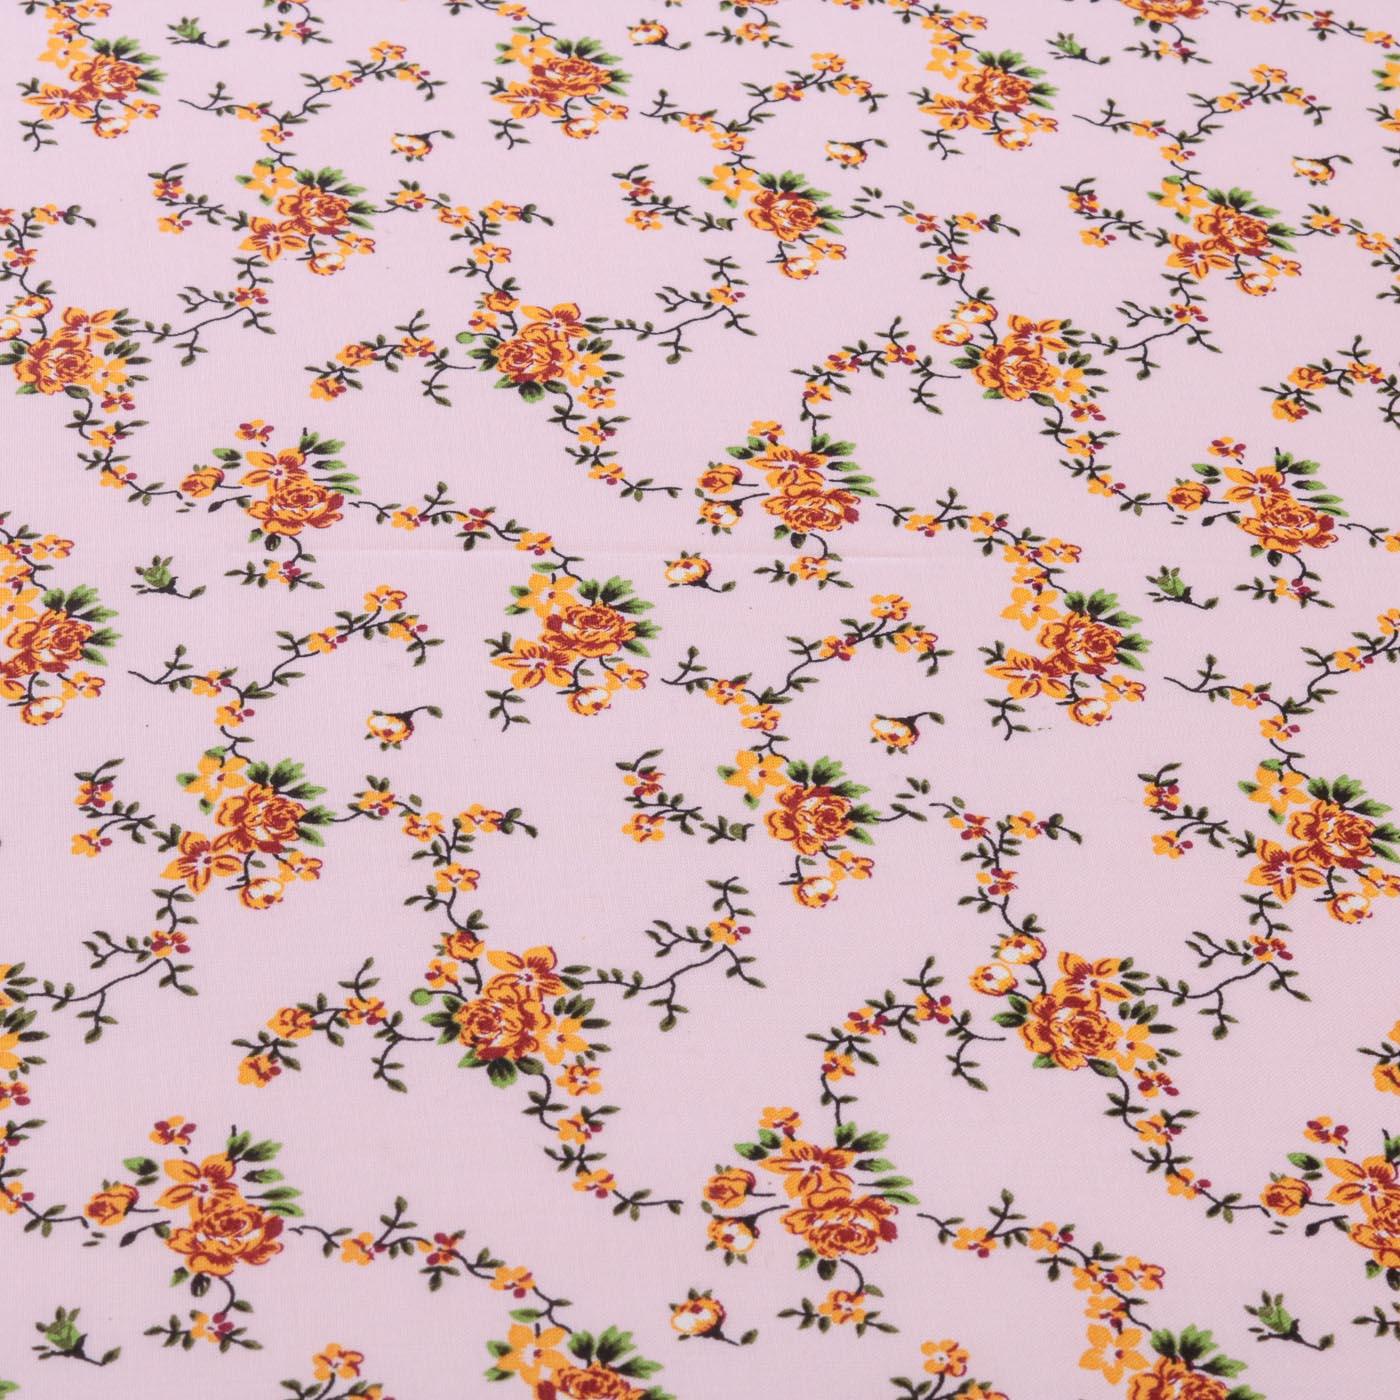 Tecido Viscose Estampado Flores 100% Viscose Rosa Bebê